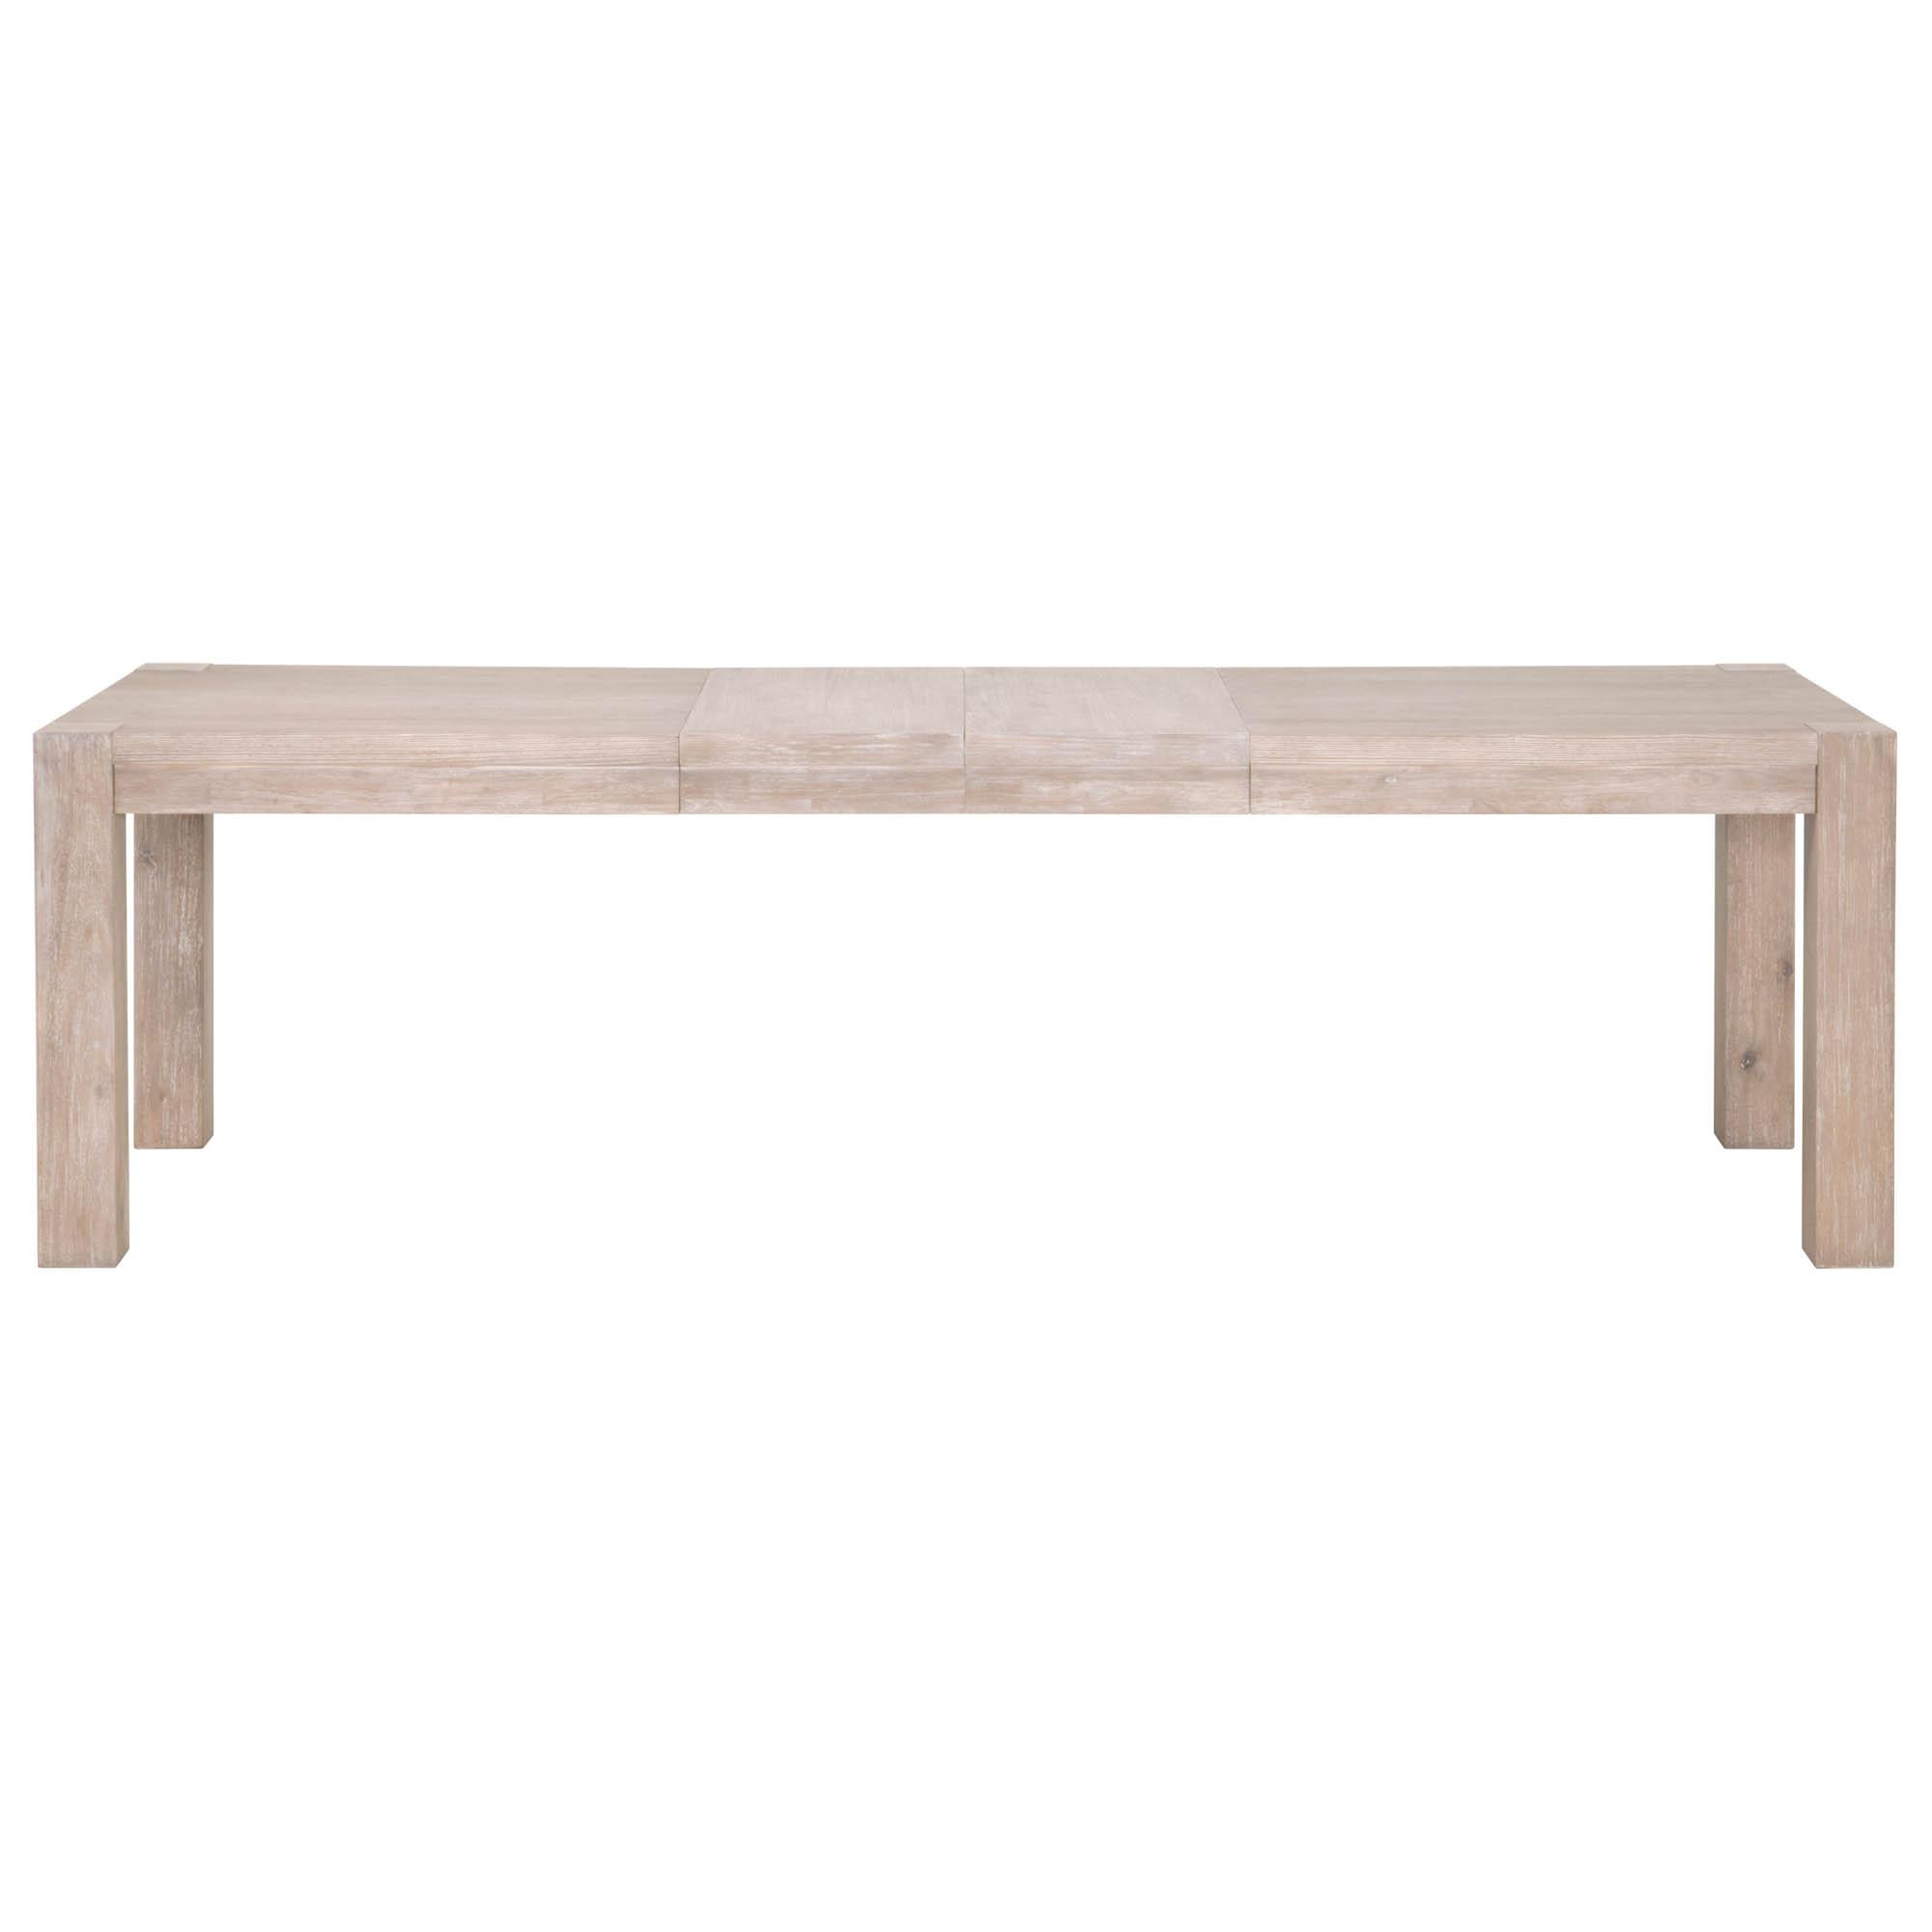 adextension-dining-table-natural-gray-1.jpg